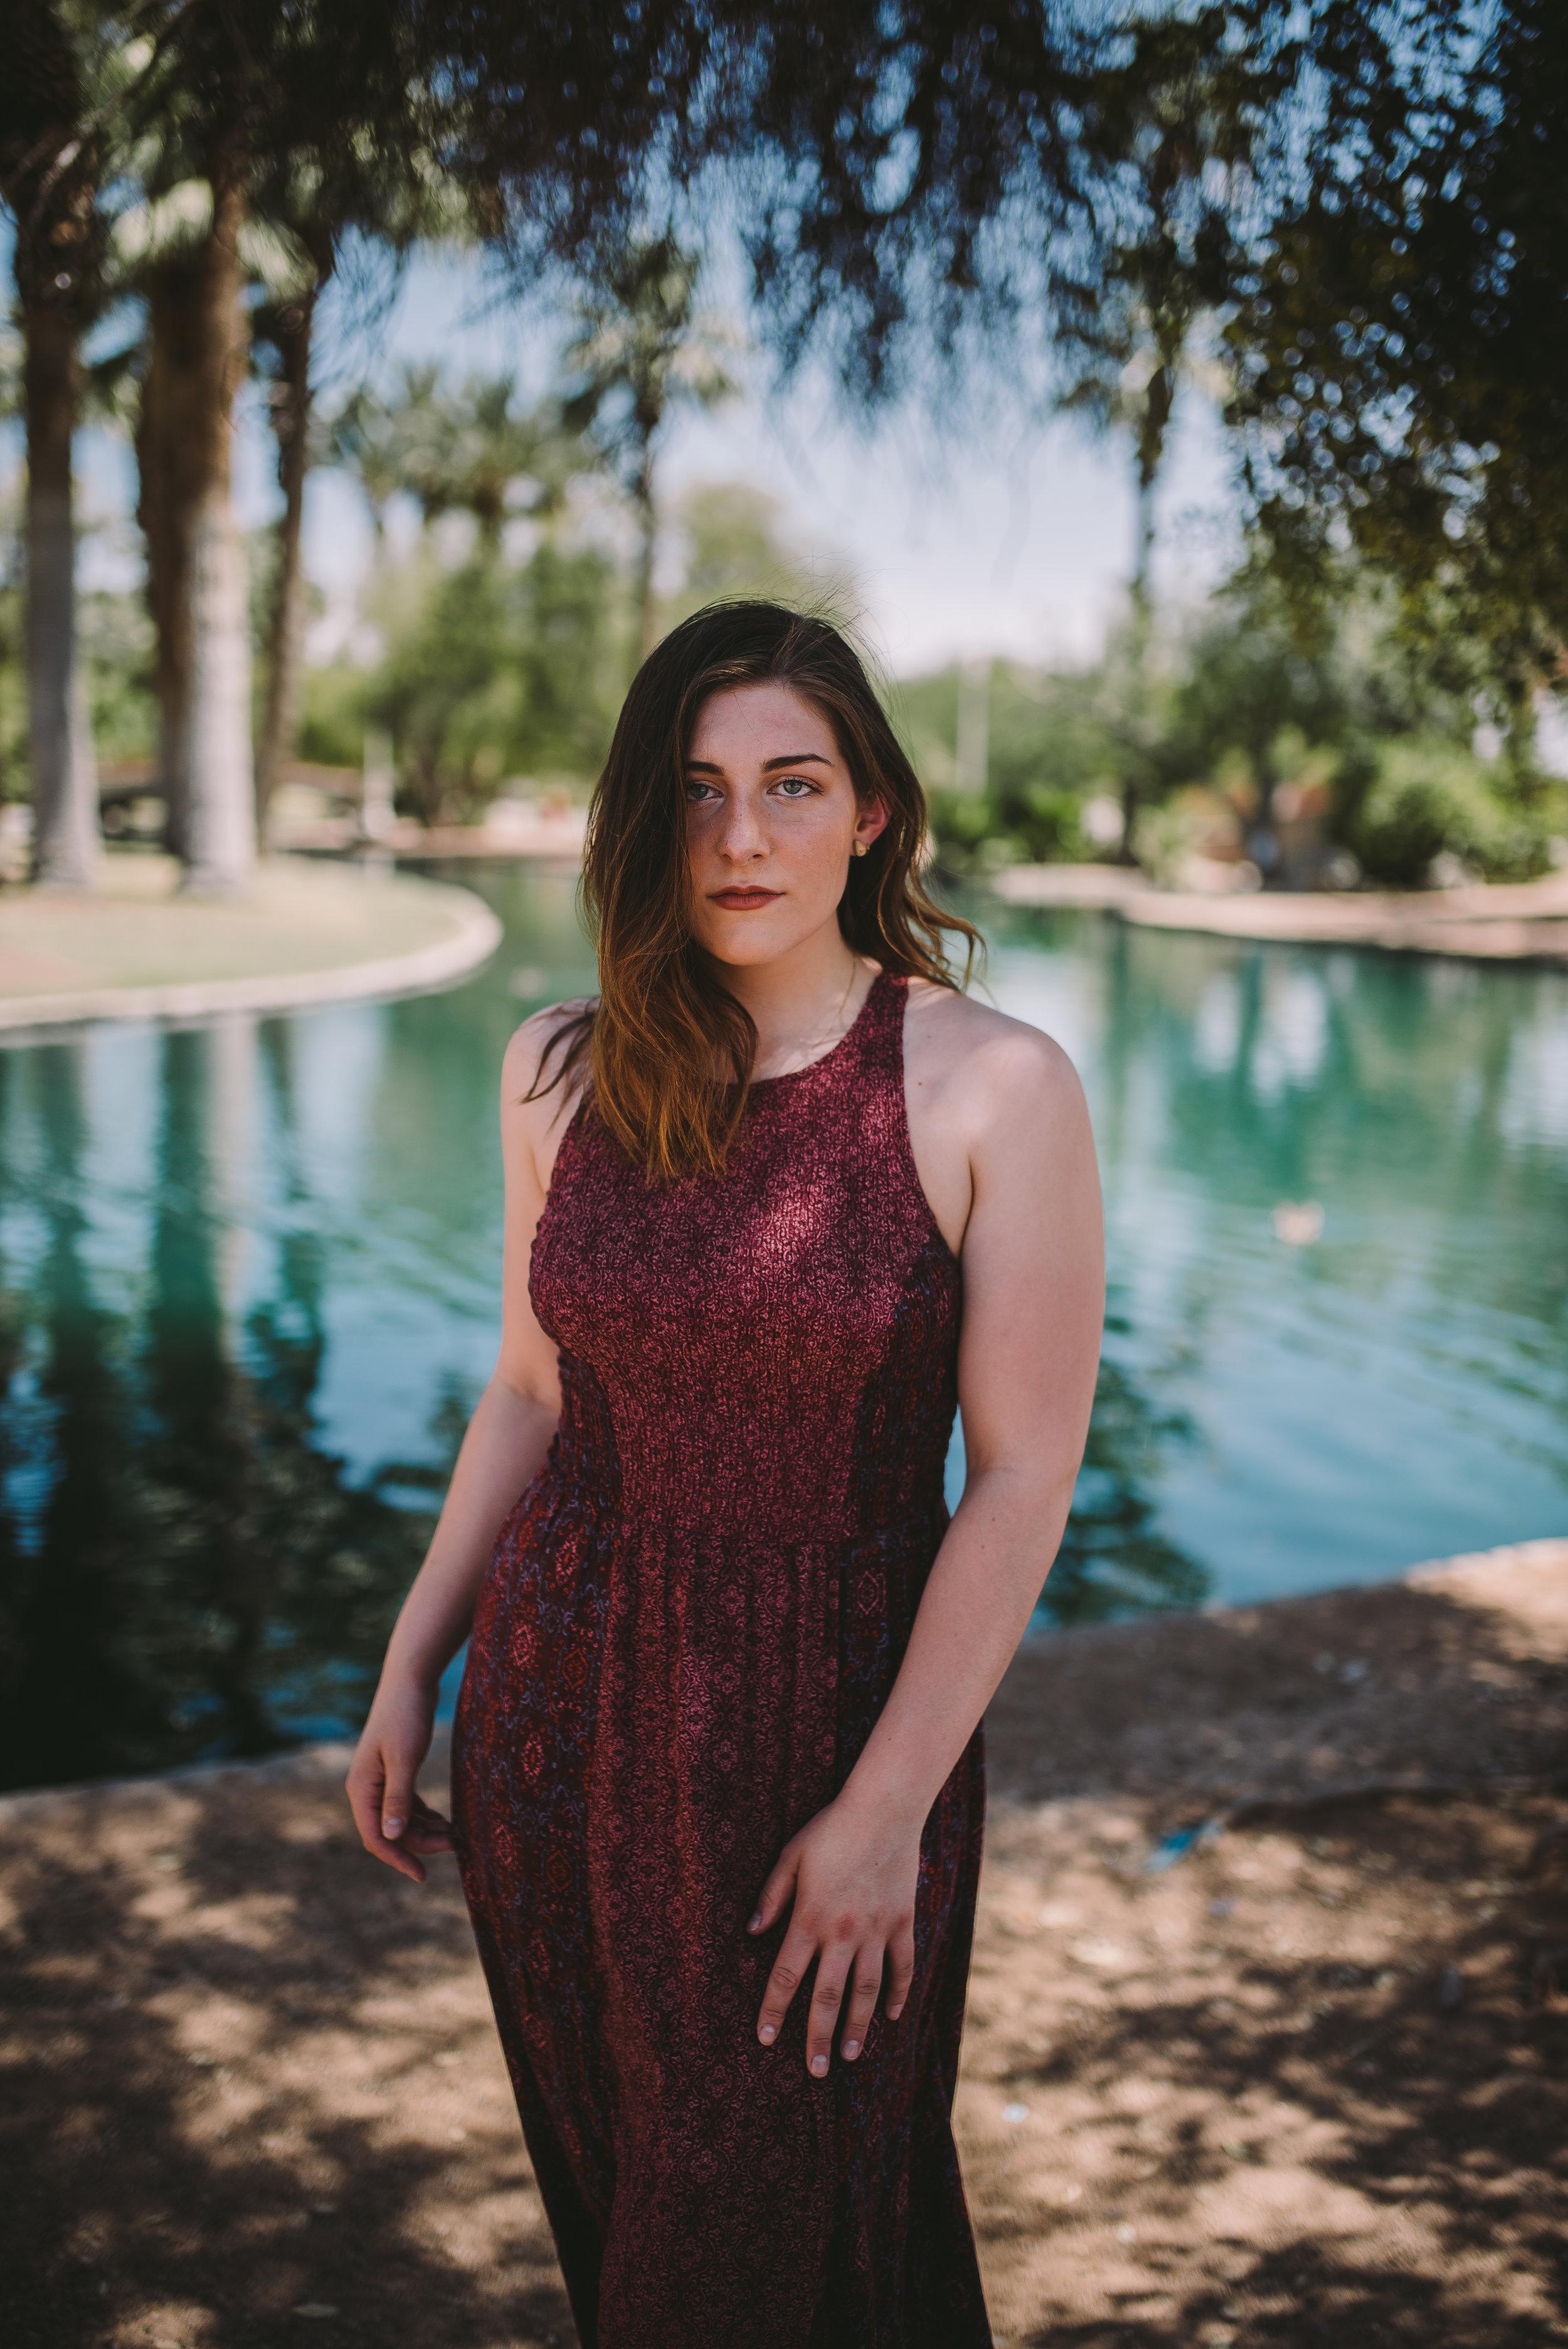 EmilyKidd_PhoenixArizona_June2018_Senior Photography In Phoenix Arizona_ArizonaSeniorPhotographer_SamanthaRosePhotography_BLOG_024.JPG